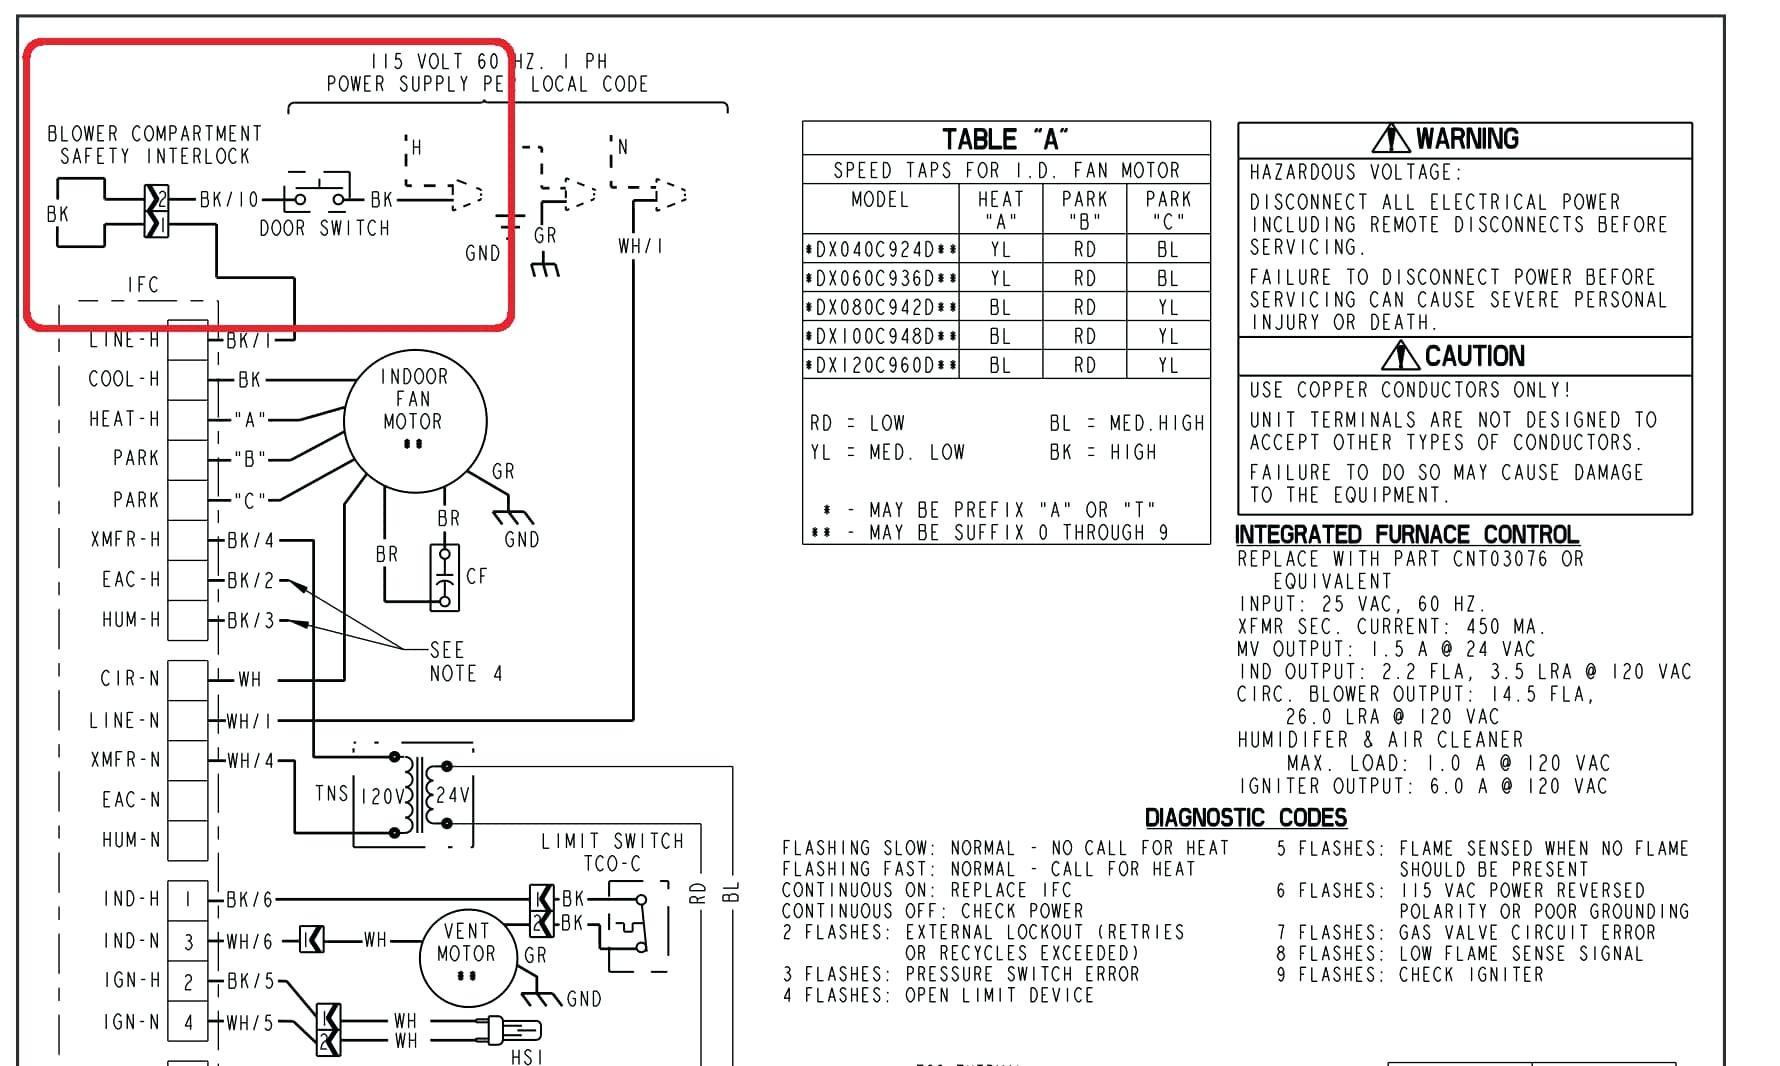 john deere lt155 wiring diagram evinrude 225 ficht image lt180